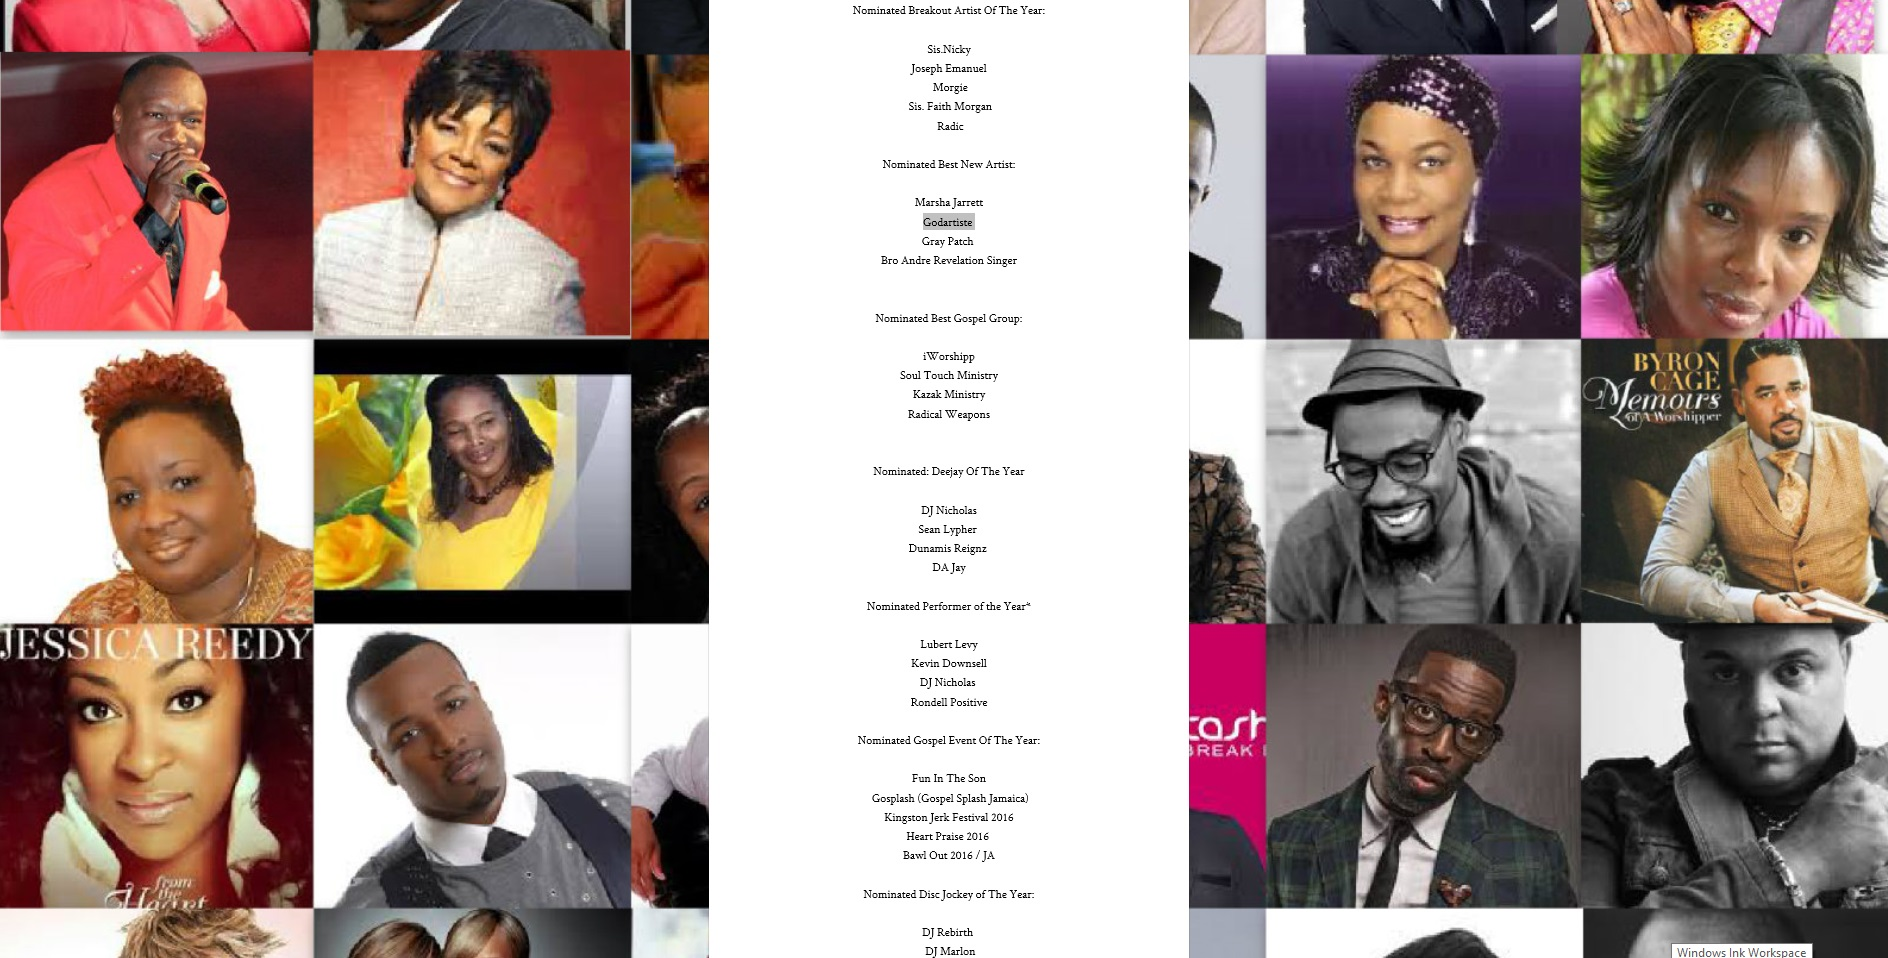 Gospel Hall Of Fame Induction & Award Ceremony 2016 (Caribbean Results) - Godartiste Nomination